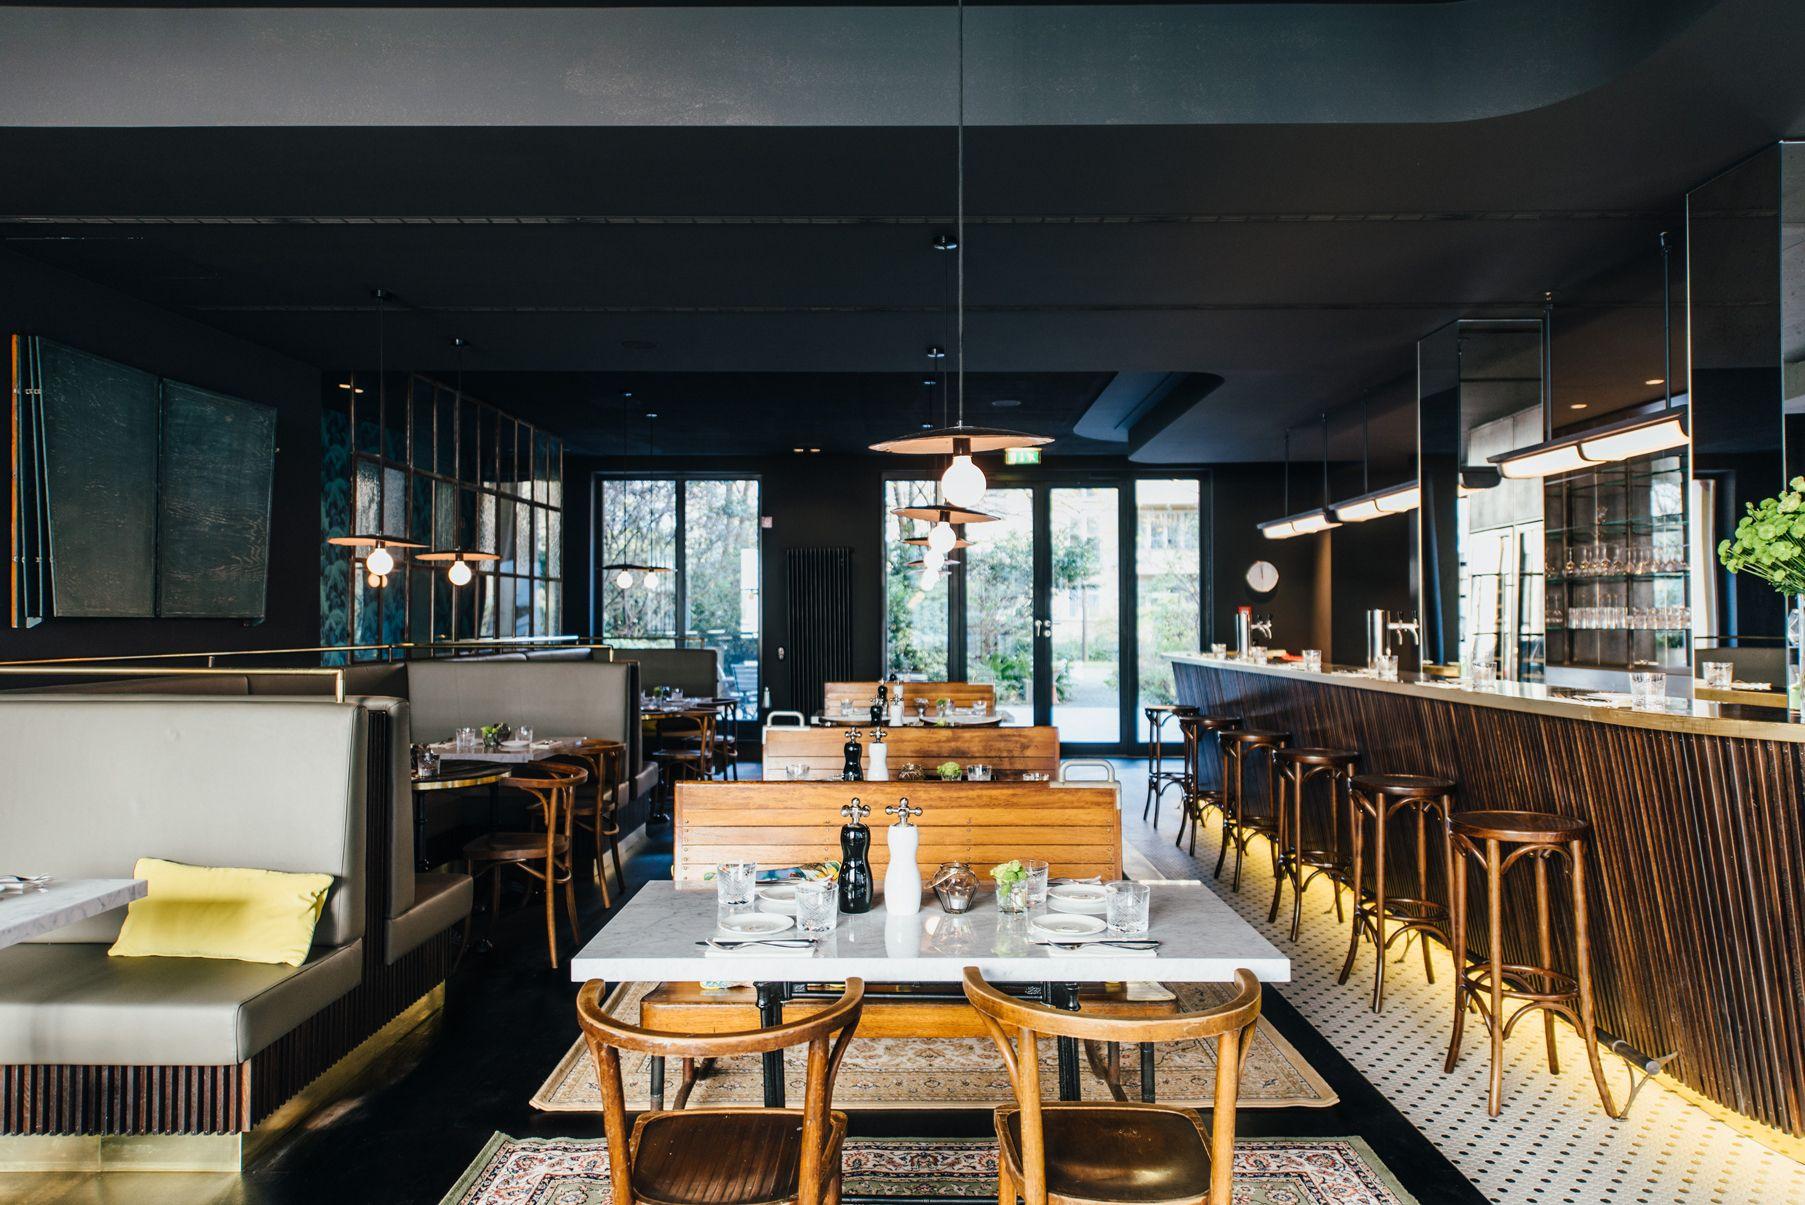 munich - tim raue - tertianum - restaurant - brasserie - timber